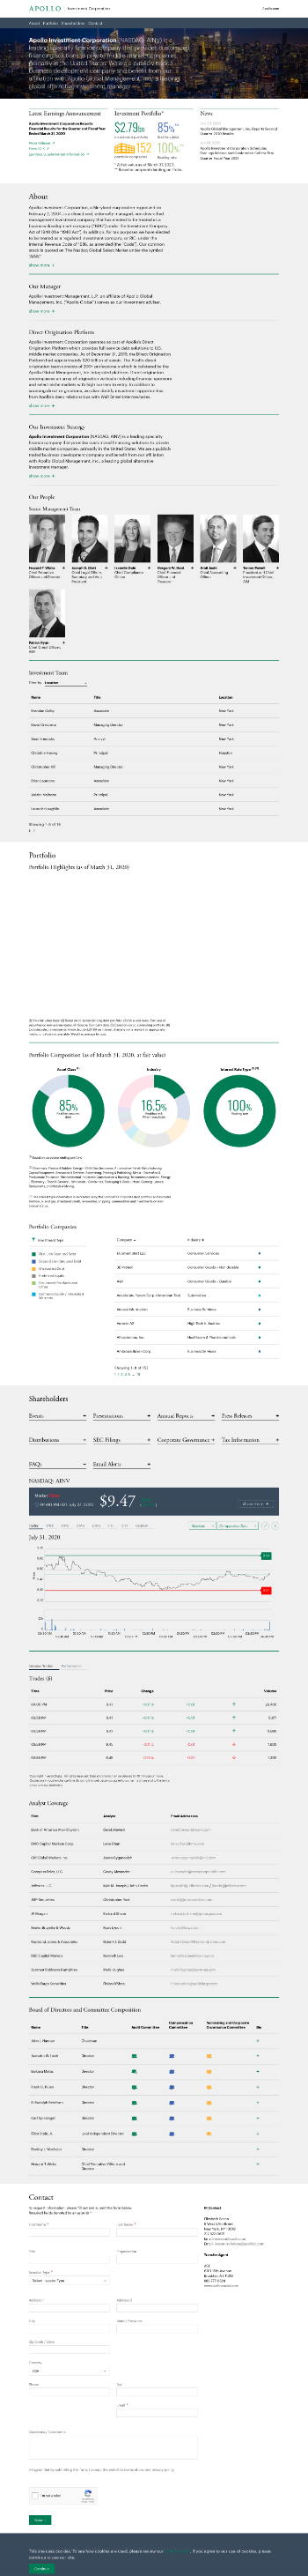 Apollo Investment Corporation Website Screenshot